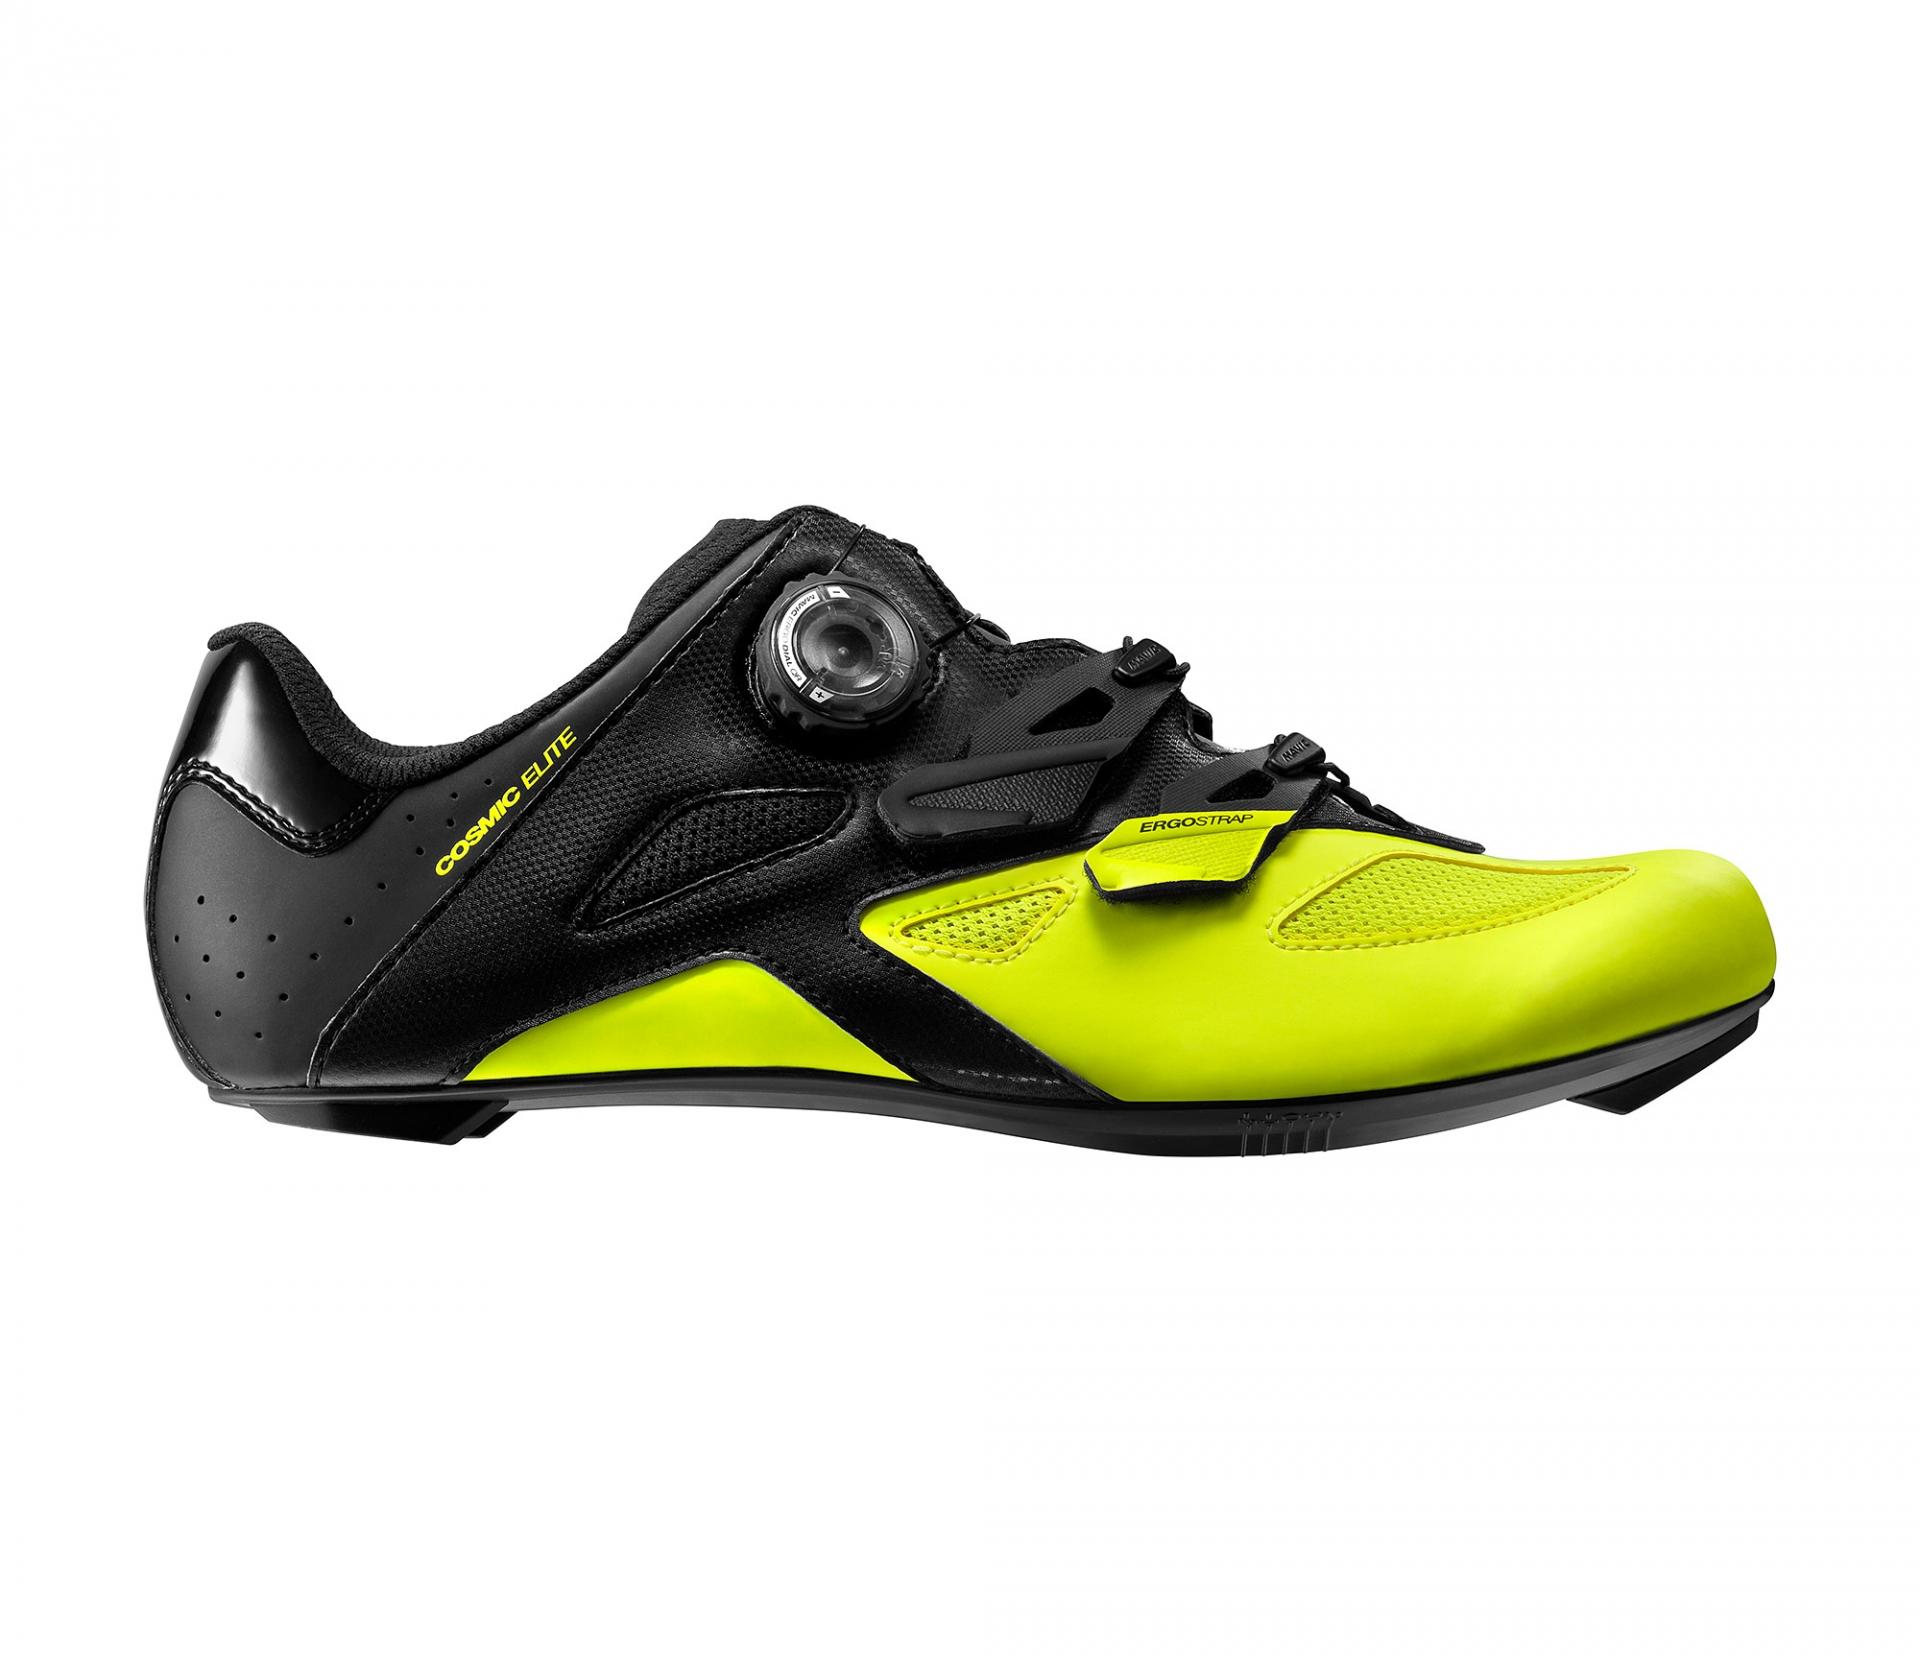 Chaussures route Mavic Cosmic Elite Noir/Jaune fluo - 44